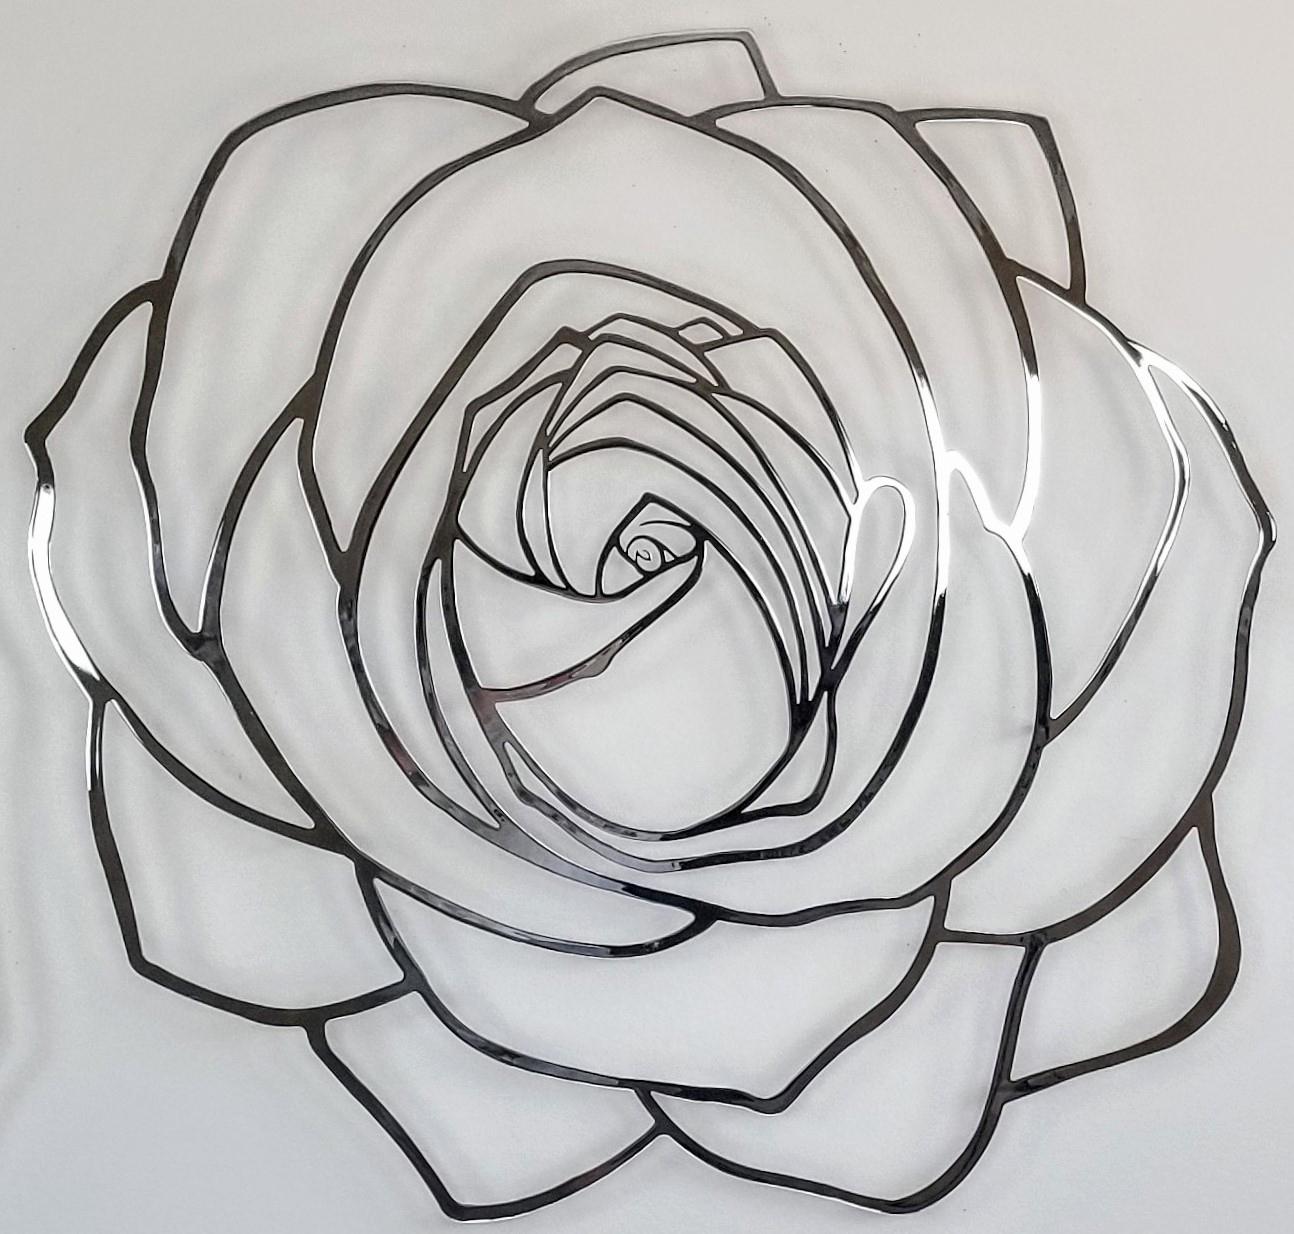 Auen - Mirror Rose